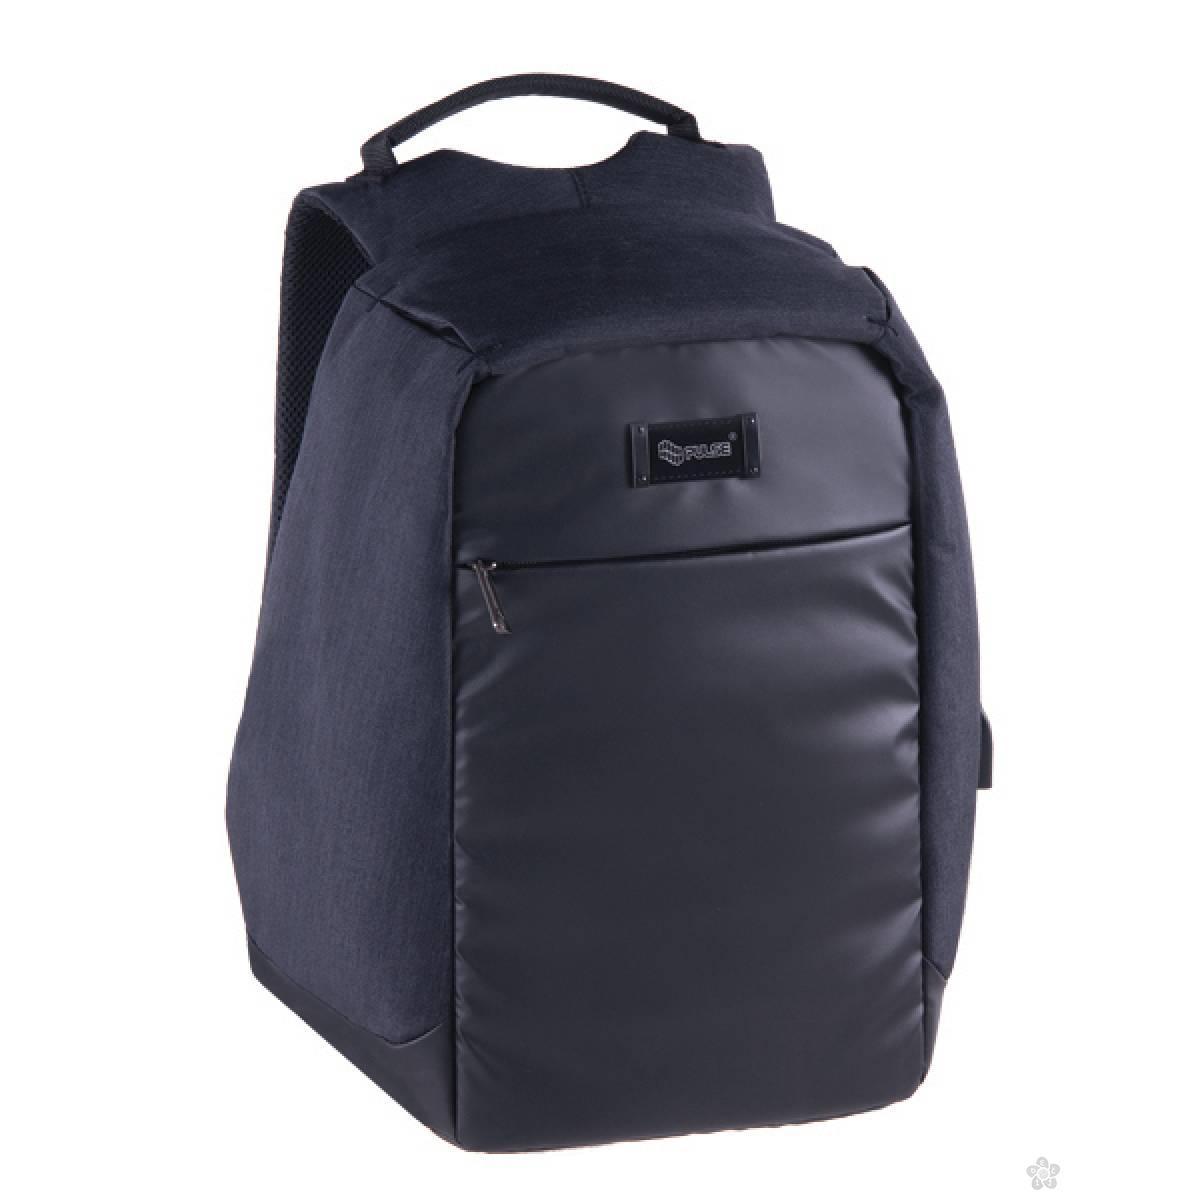 Ranac/Poslovna torba Anti Theft Dark Gray 121536